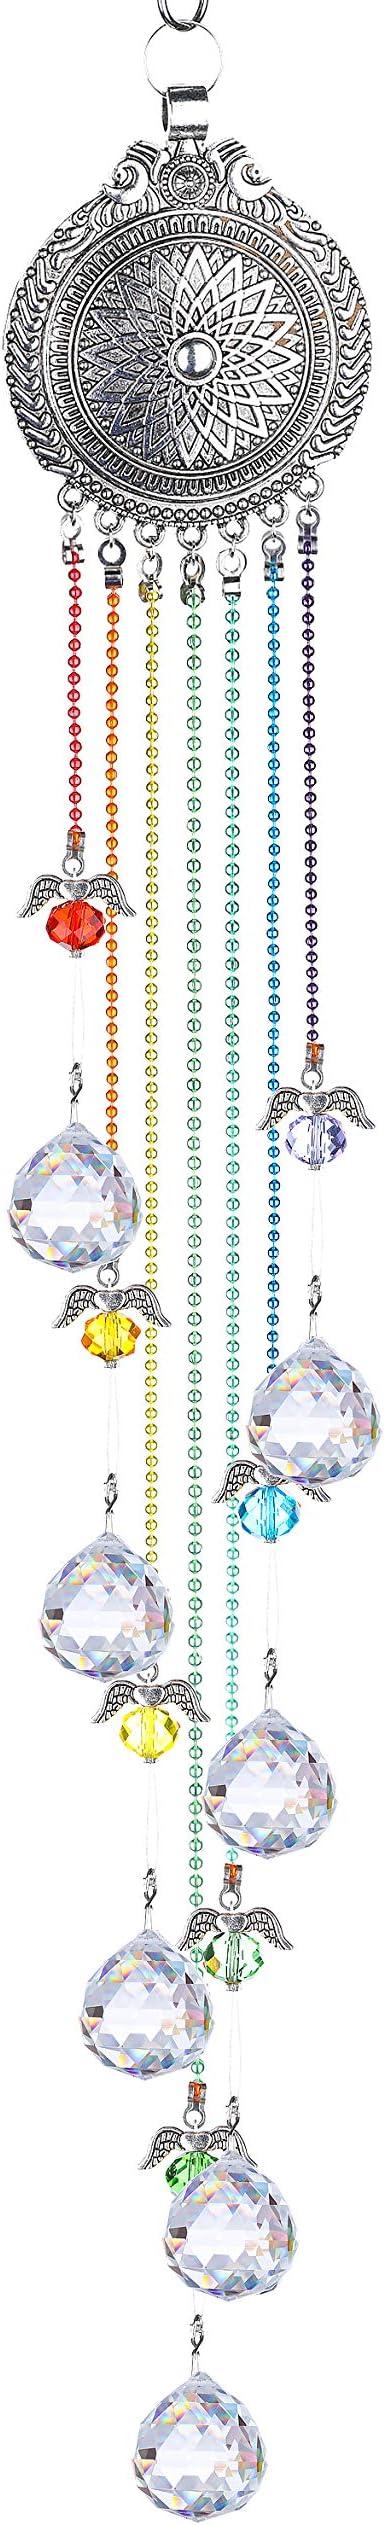 H/&D HYALINE /& DORA Crystal Rainbow Suncatcher Hanging Half Moon Ornament for Home Garden Decoration Glass Ball Prism Pendant